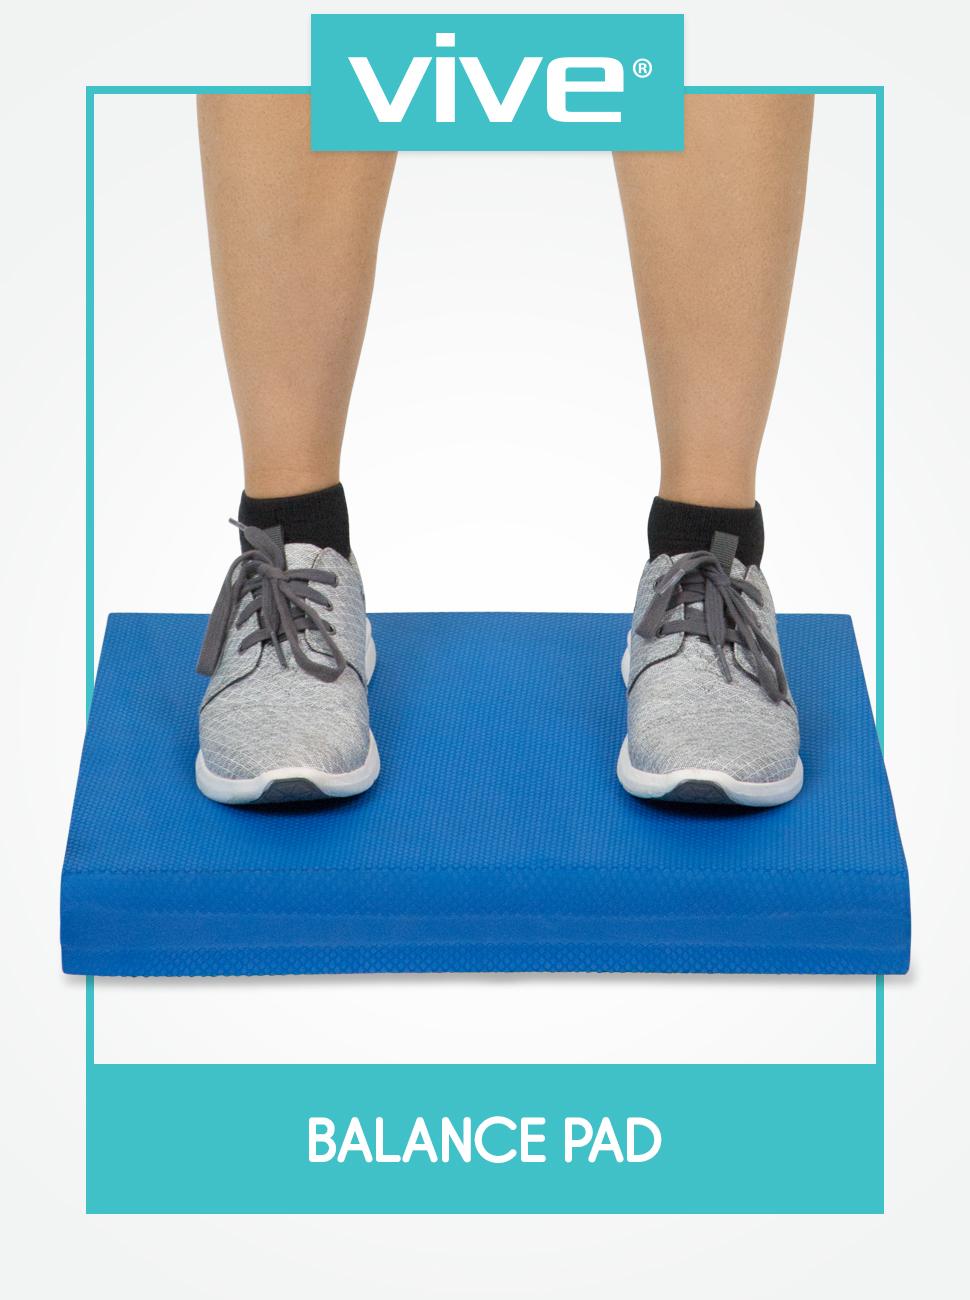 Amazon.com: Vive Balance Pad - Esterilla de yoga de espuma ...